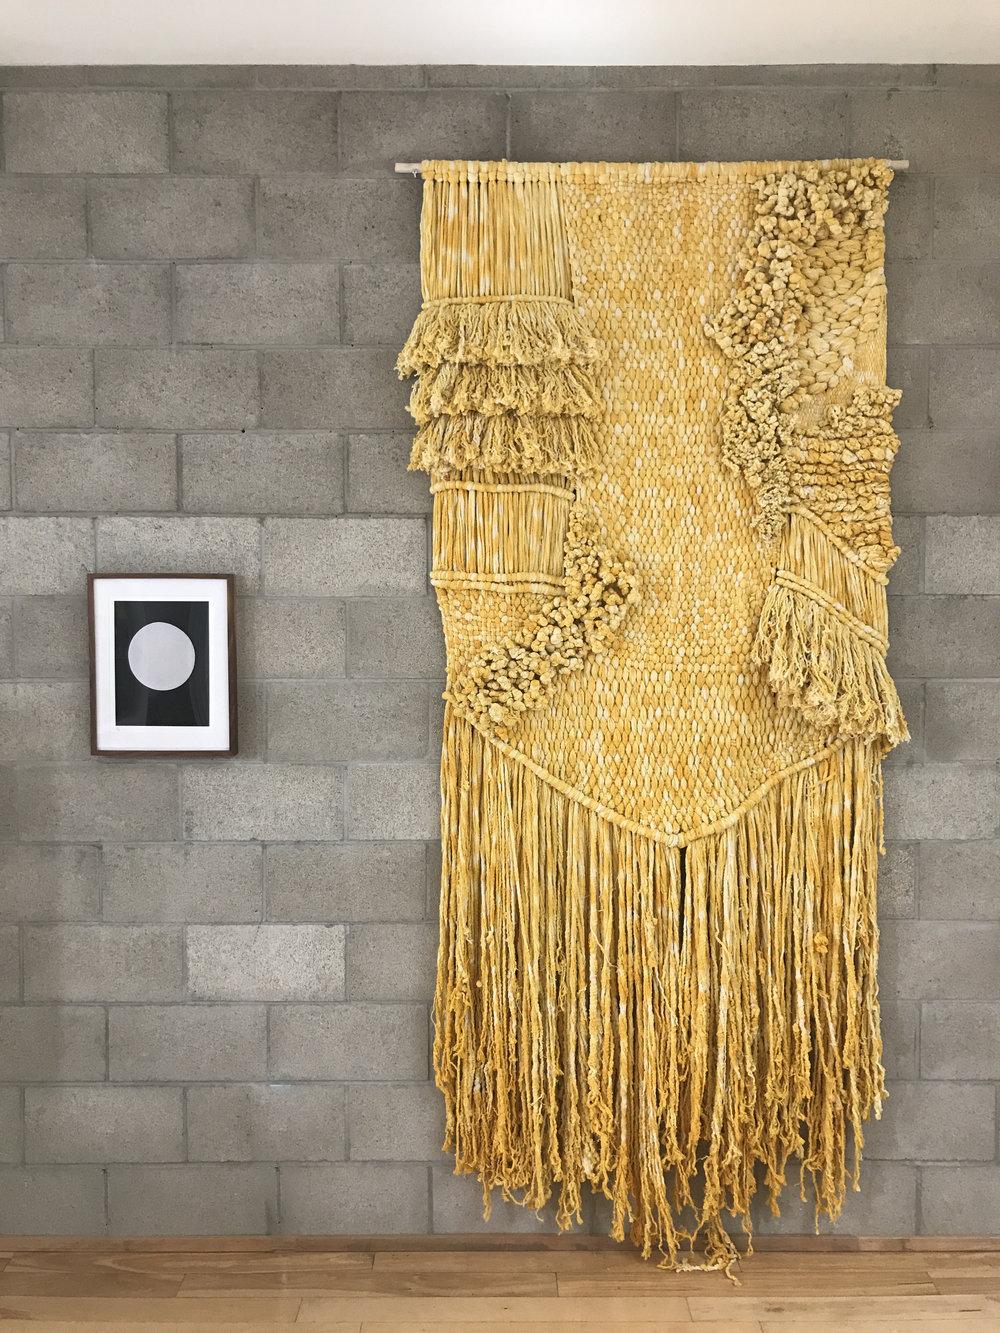 ARTISTS:  ERIN MORRISON  TANYA AGUINIGA